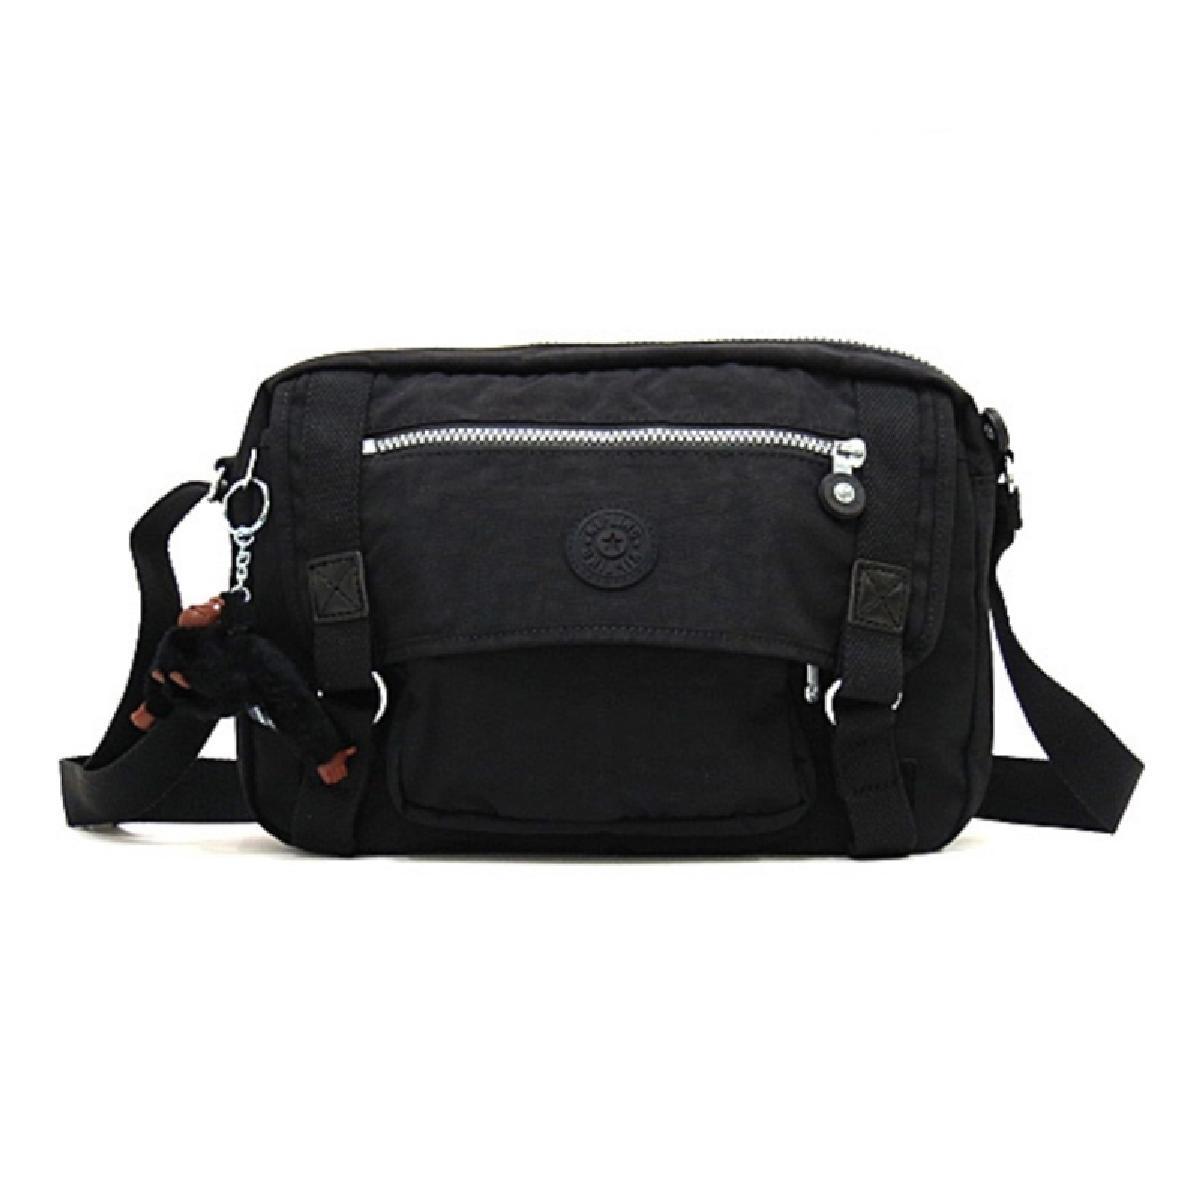 Gracy Crossbody Bag (HB6260-001) - Black (Parallel Import goods) 36041c86c6c35